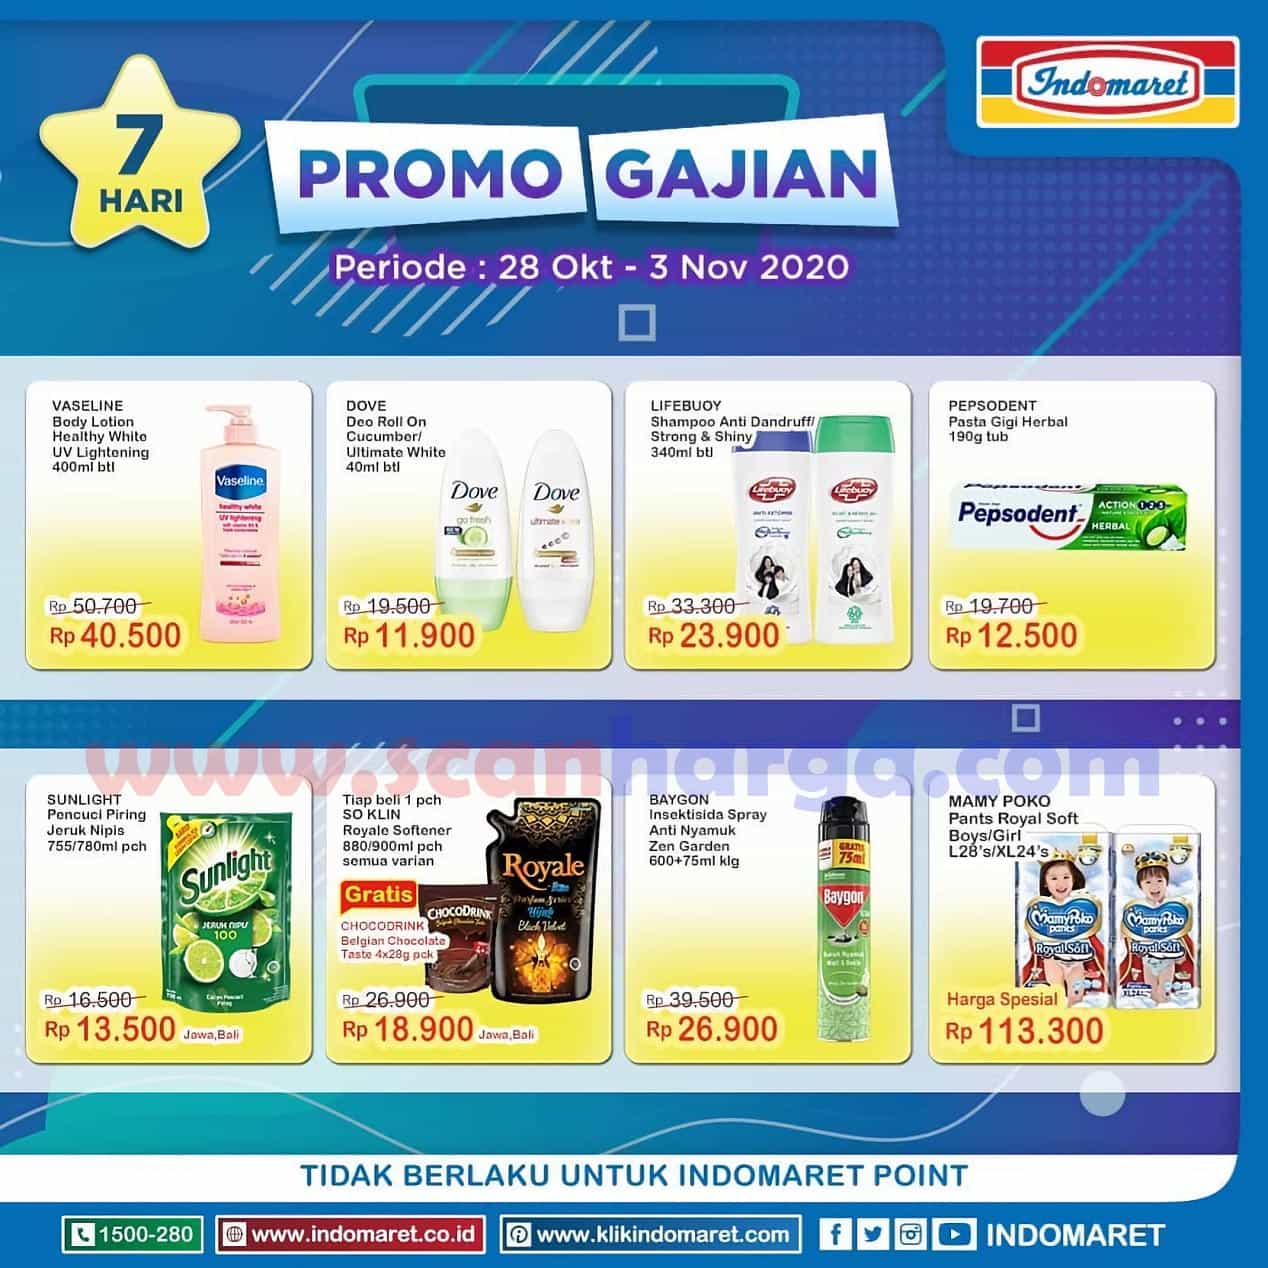 JSM INDOMARET GAJIAN Promo Tebus Murah Periode 28 Oktober - 1 November 2020 3